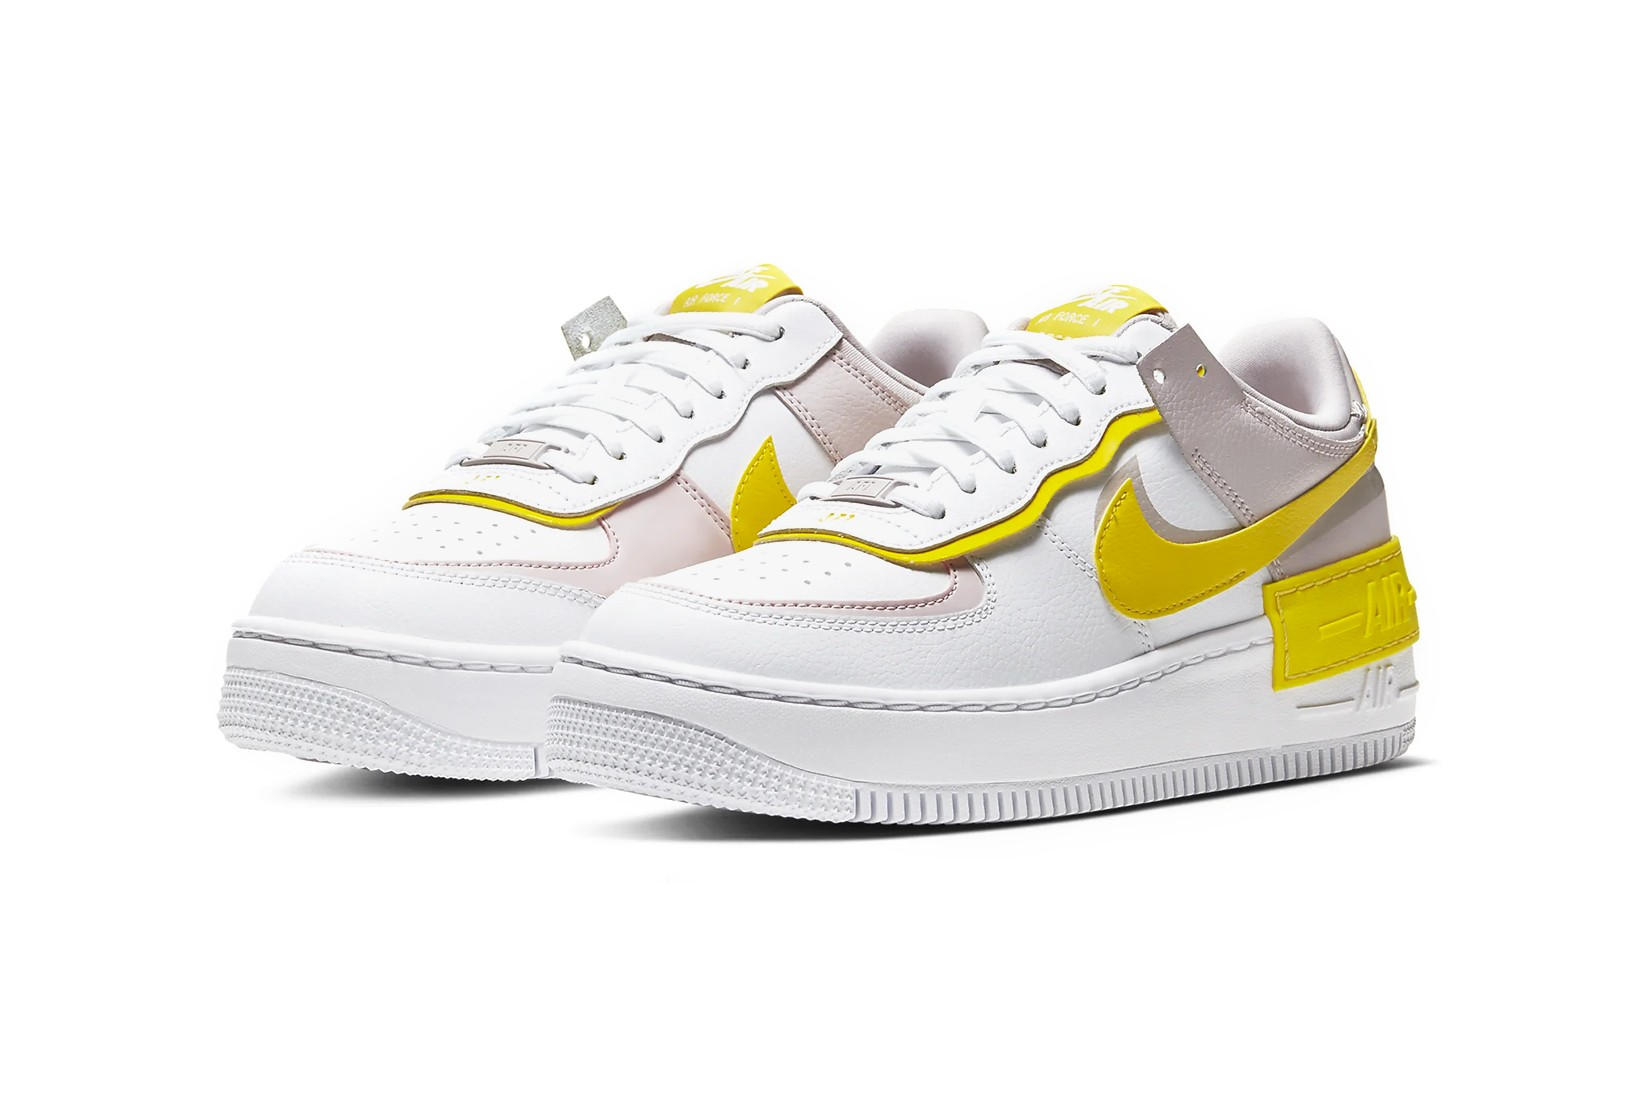 Nike Air Force 1 Shadow Yellow/Nude